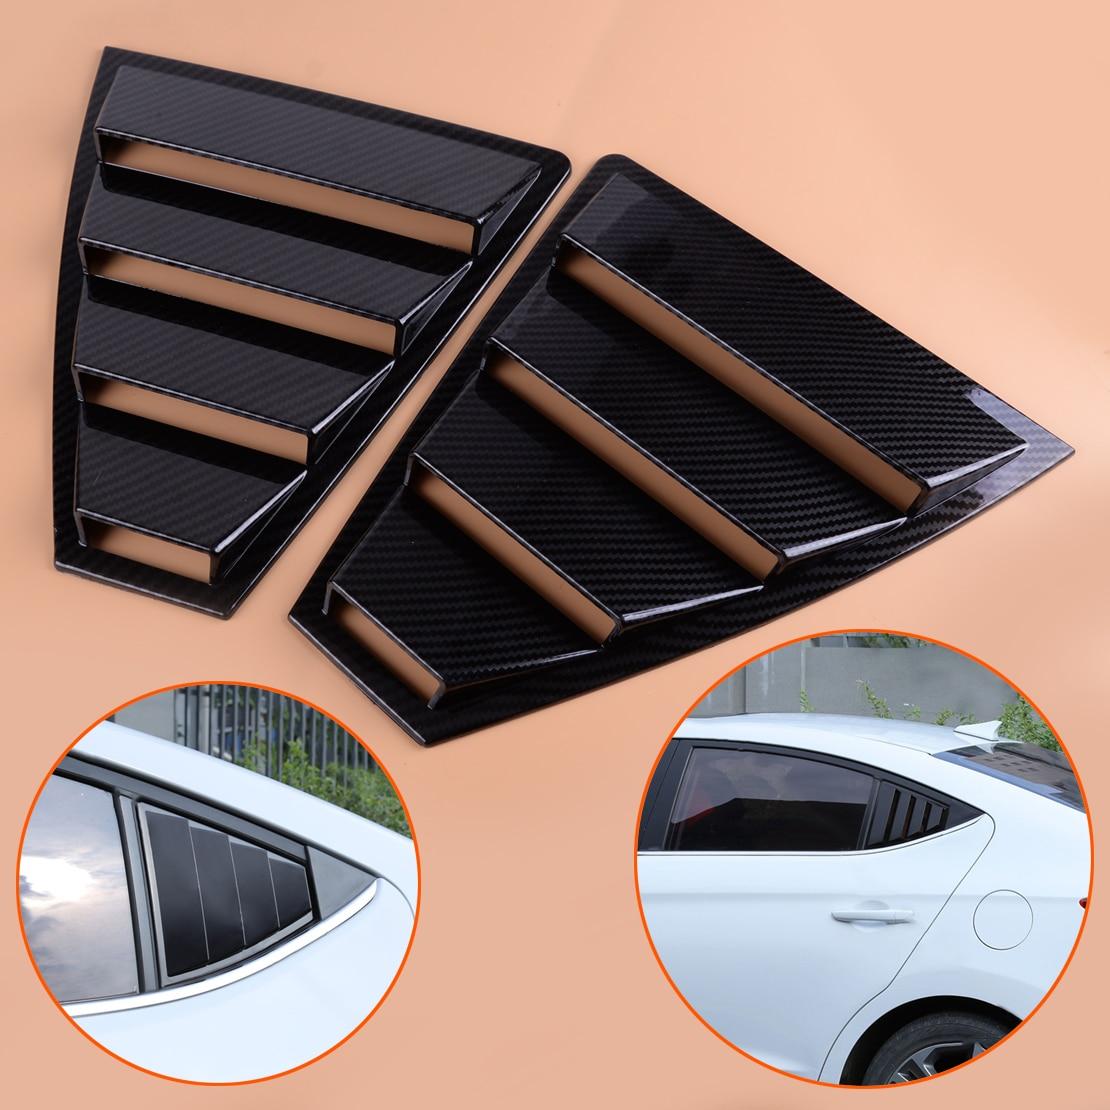 beler 2 PCS ABS Carbon Fiber Black Style Rear Window Quarter Panel Side Vent Trim Cover Fit for Hyundai Elantra 2017 2018 2019